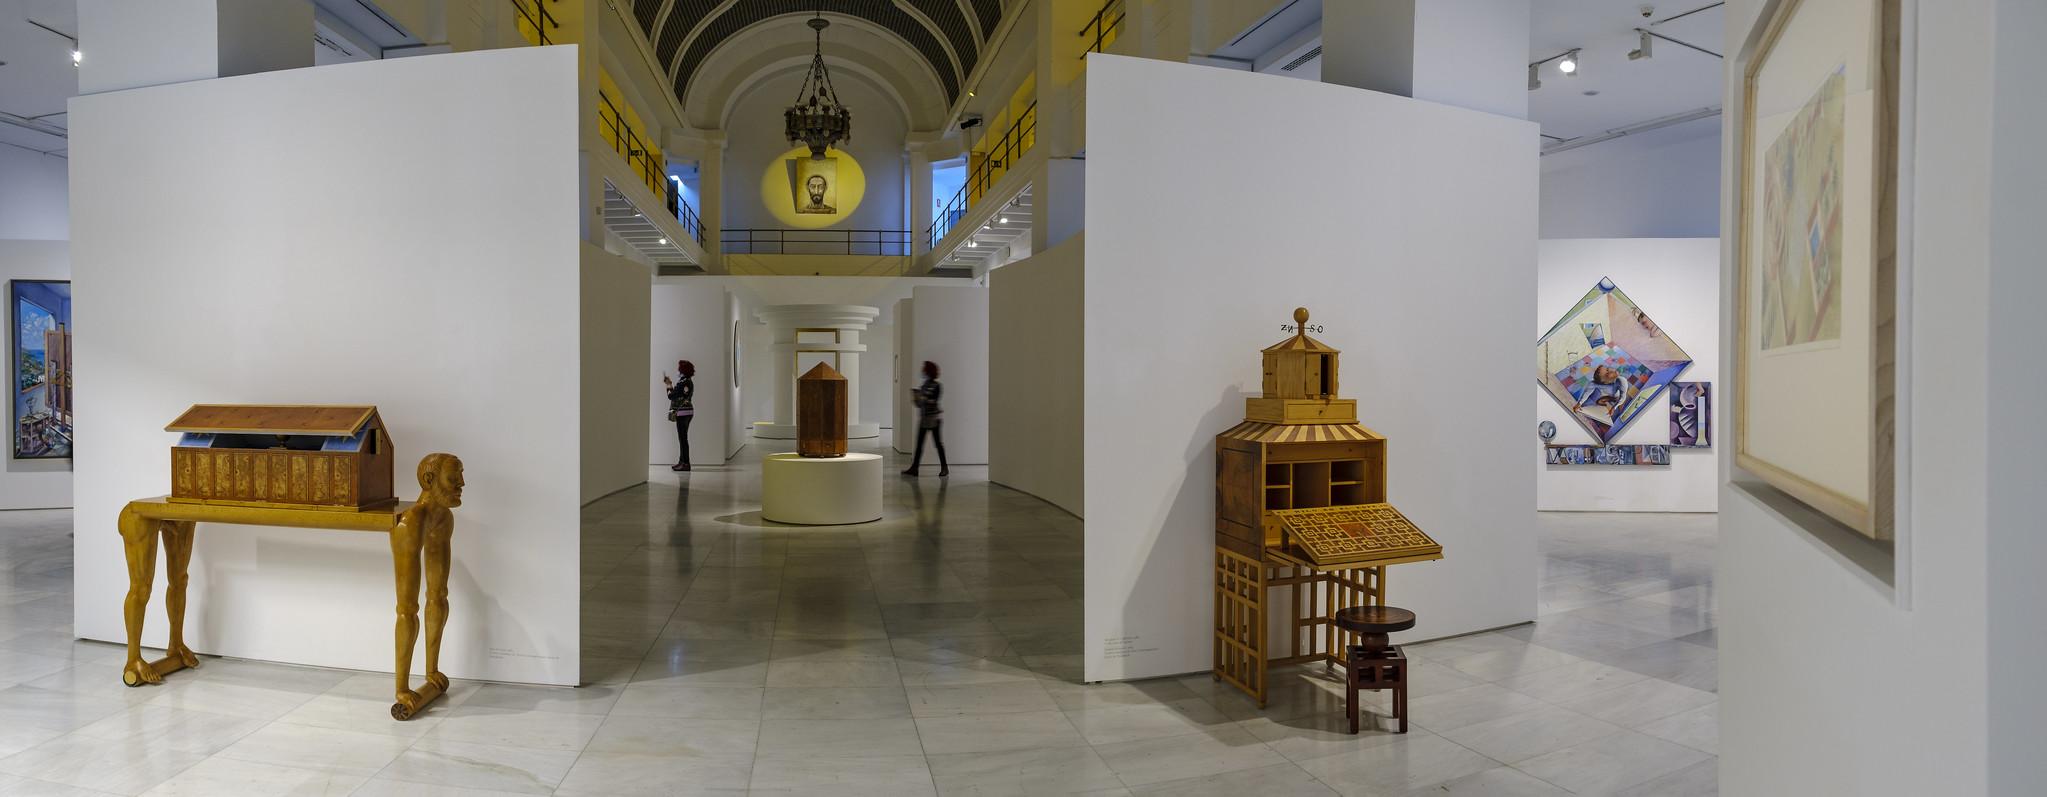 Exposición 'Guillermo Pérez Villalta. El arte como laberinto'. Fotos: Guillermo Gumiel.